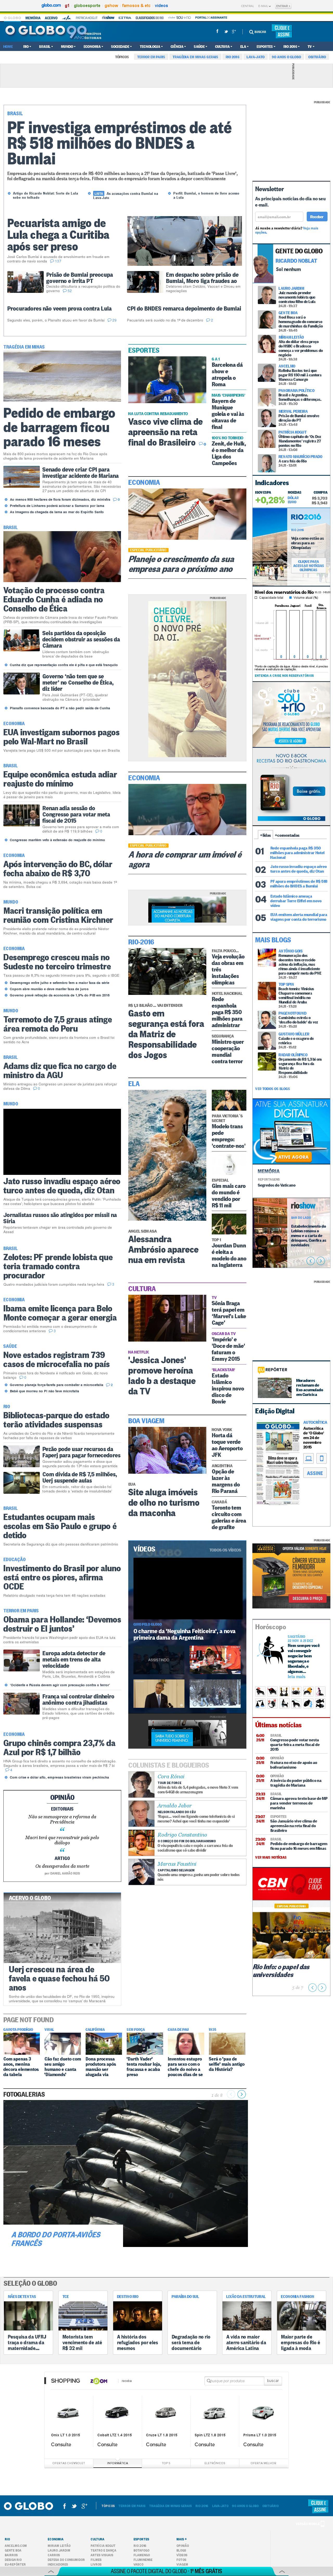 O Globo at Wednesday Nov. 25, 2015, 2:08 a.m. UTC